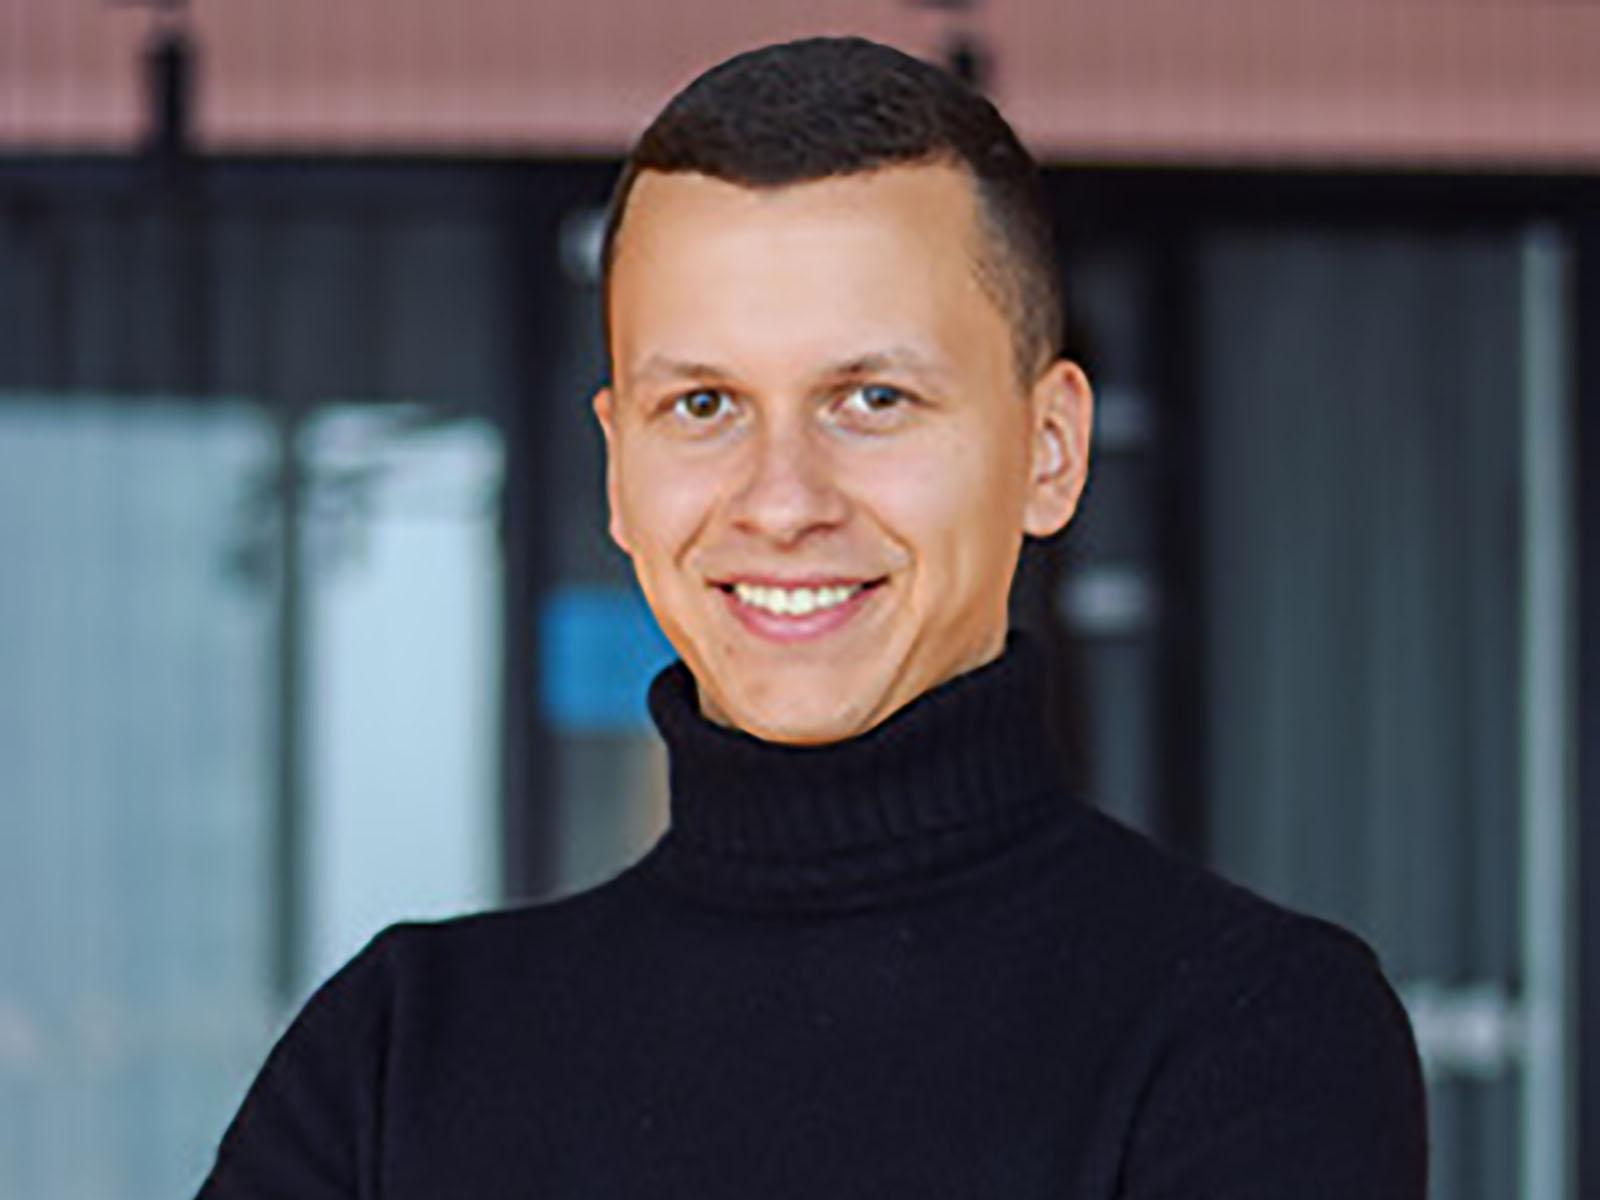 Андрей Командин — владелец маркетингового агентства Marketpeak